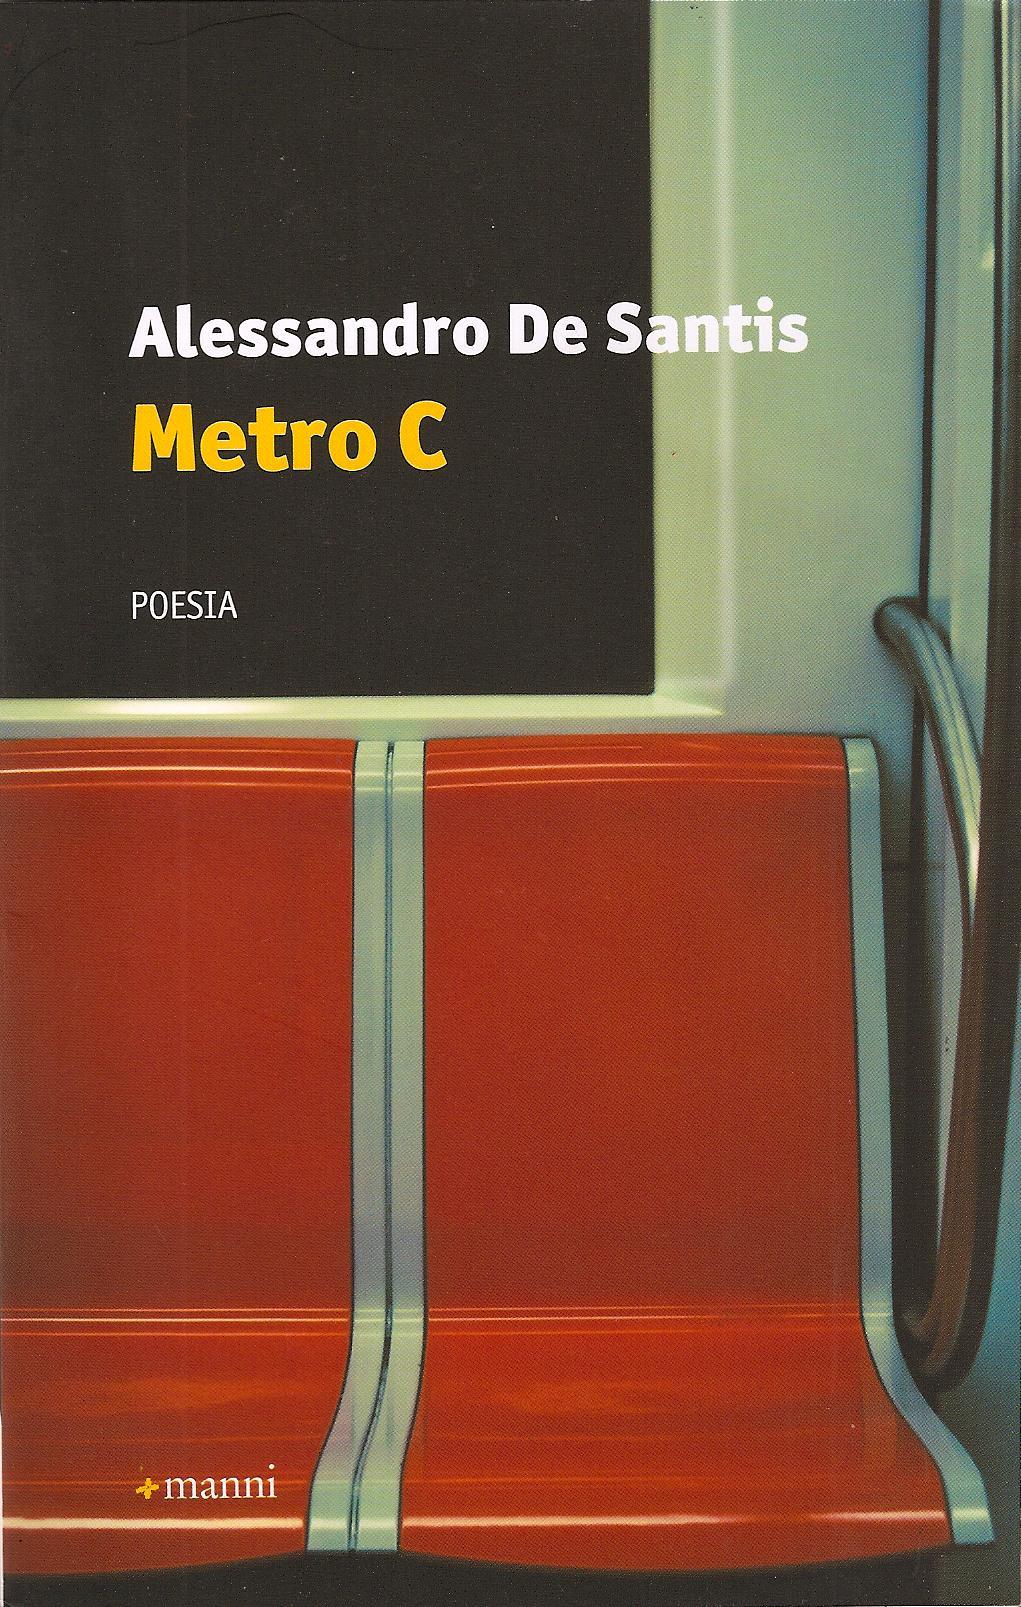 Alessandro De Santis, Metro C, Manni 2013